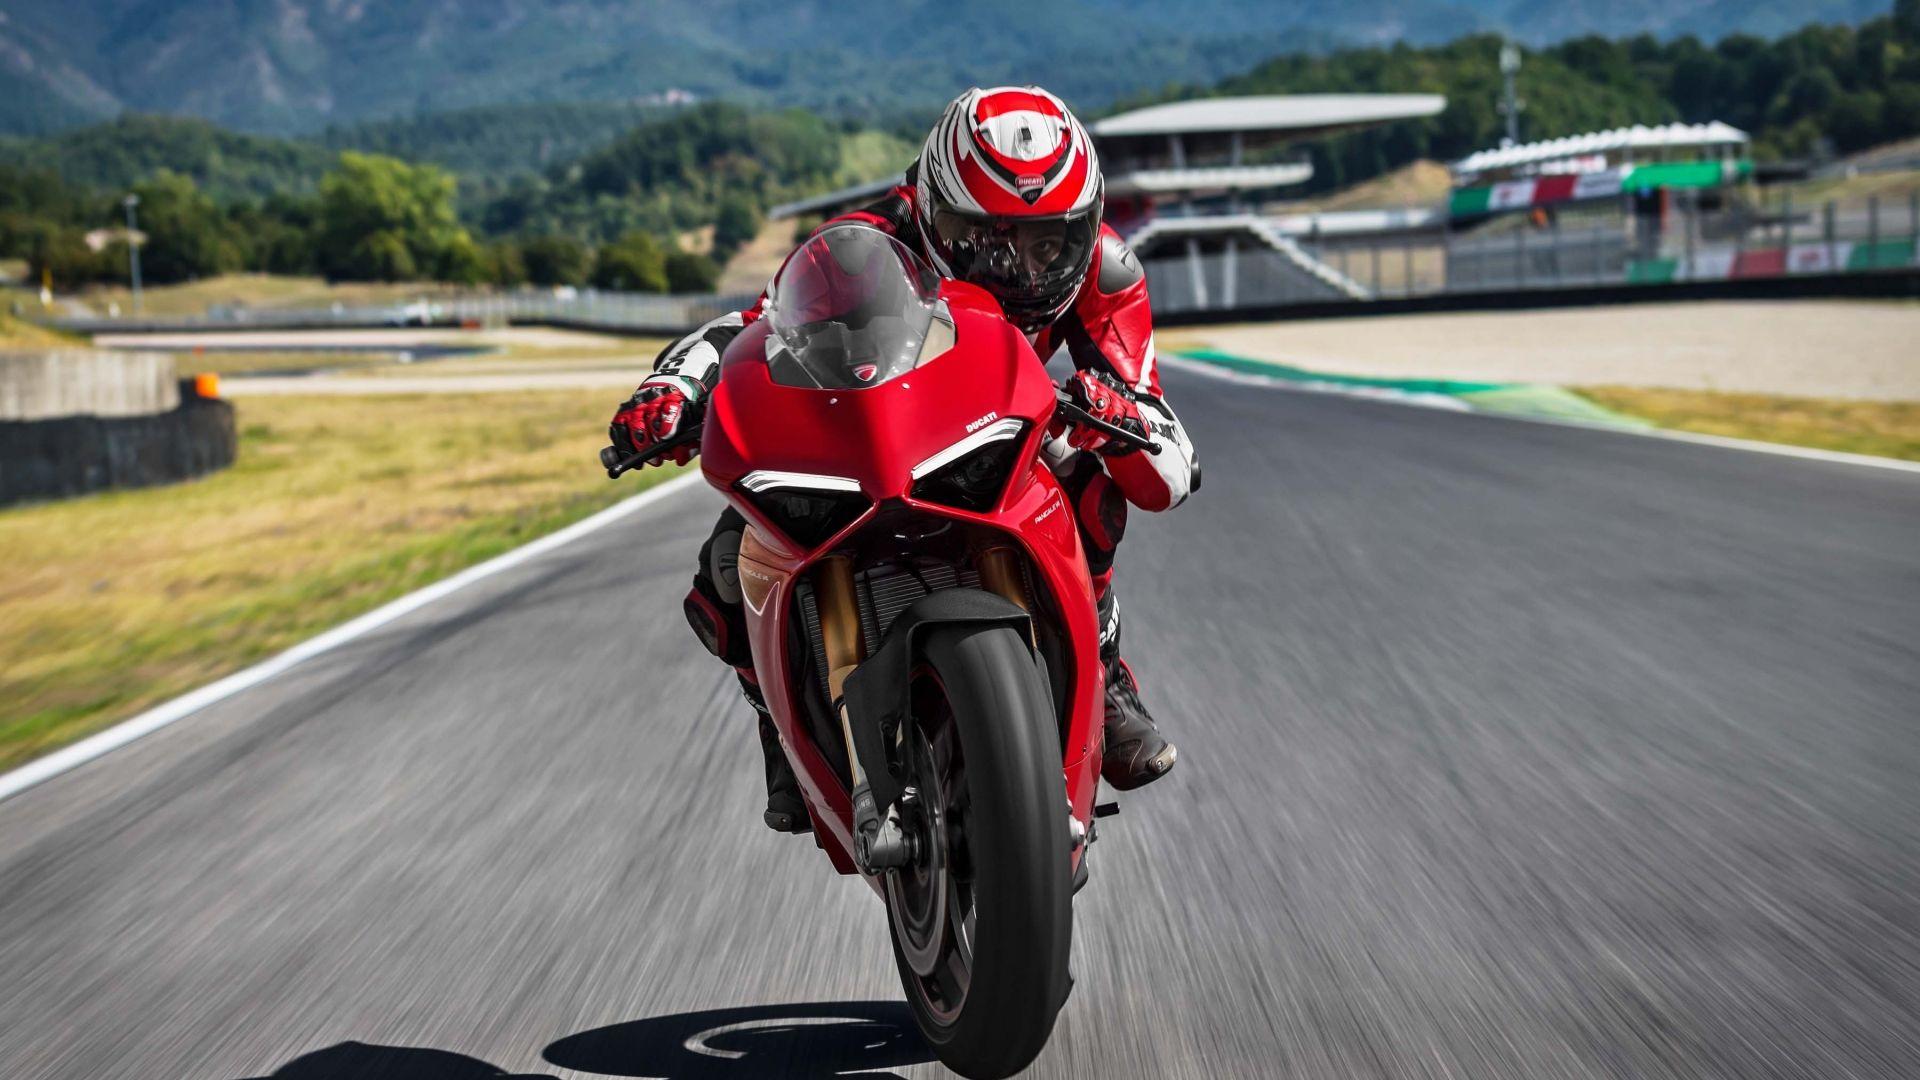 Wallpaper Ducati Panigale V4 S, 2018 bike, rider, 4k